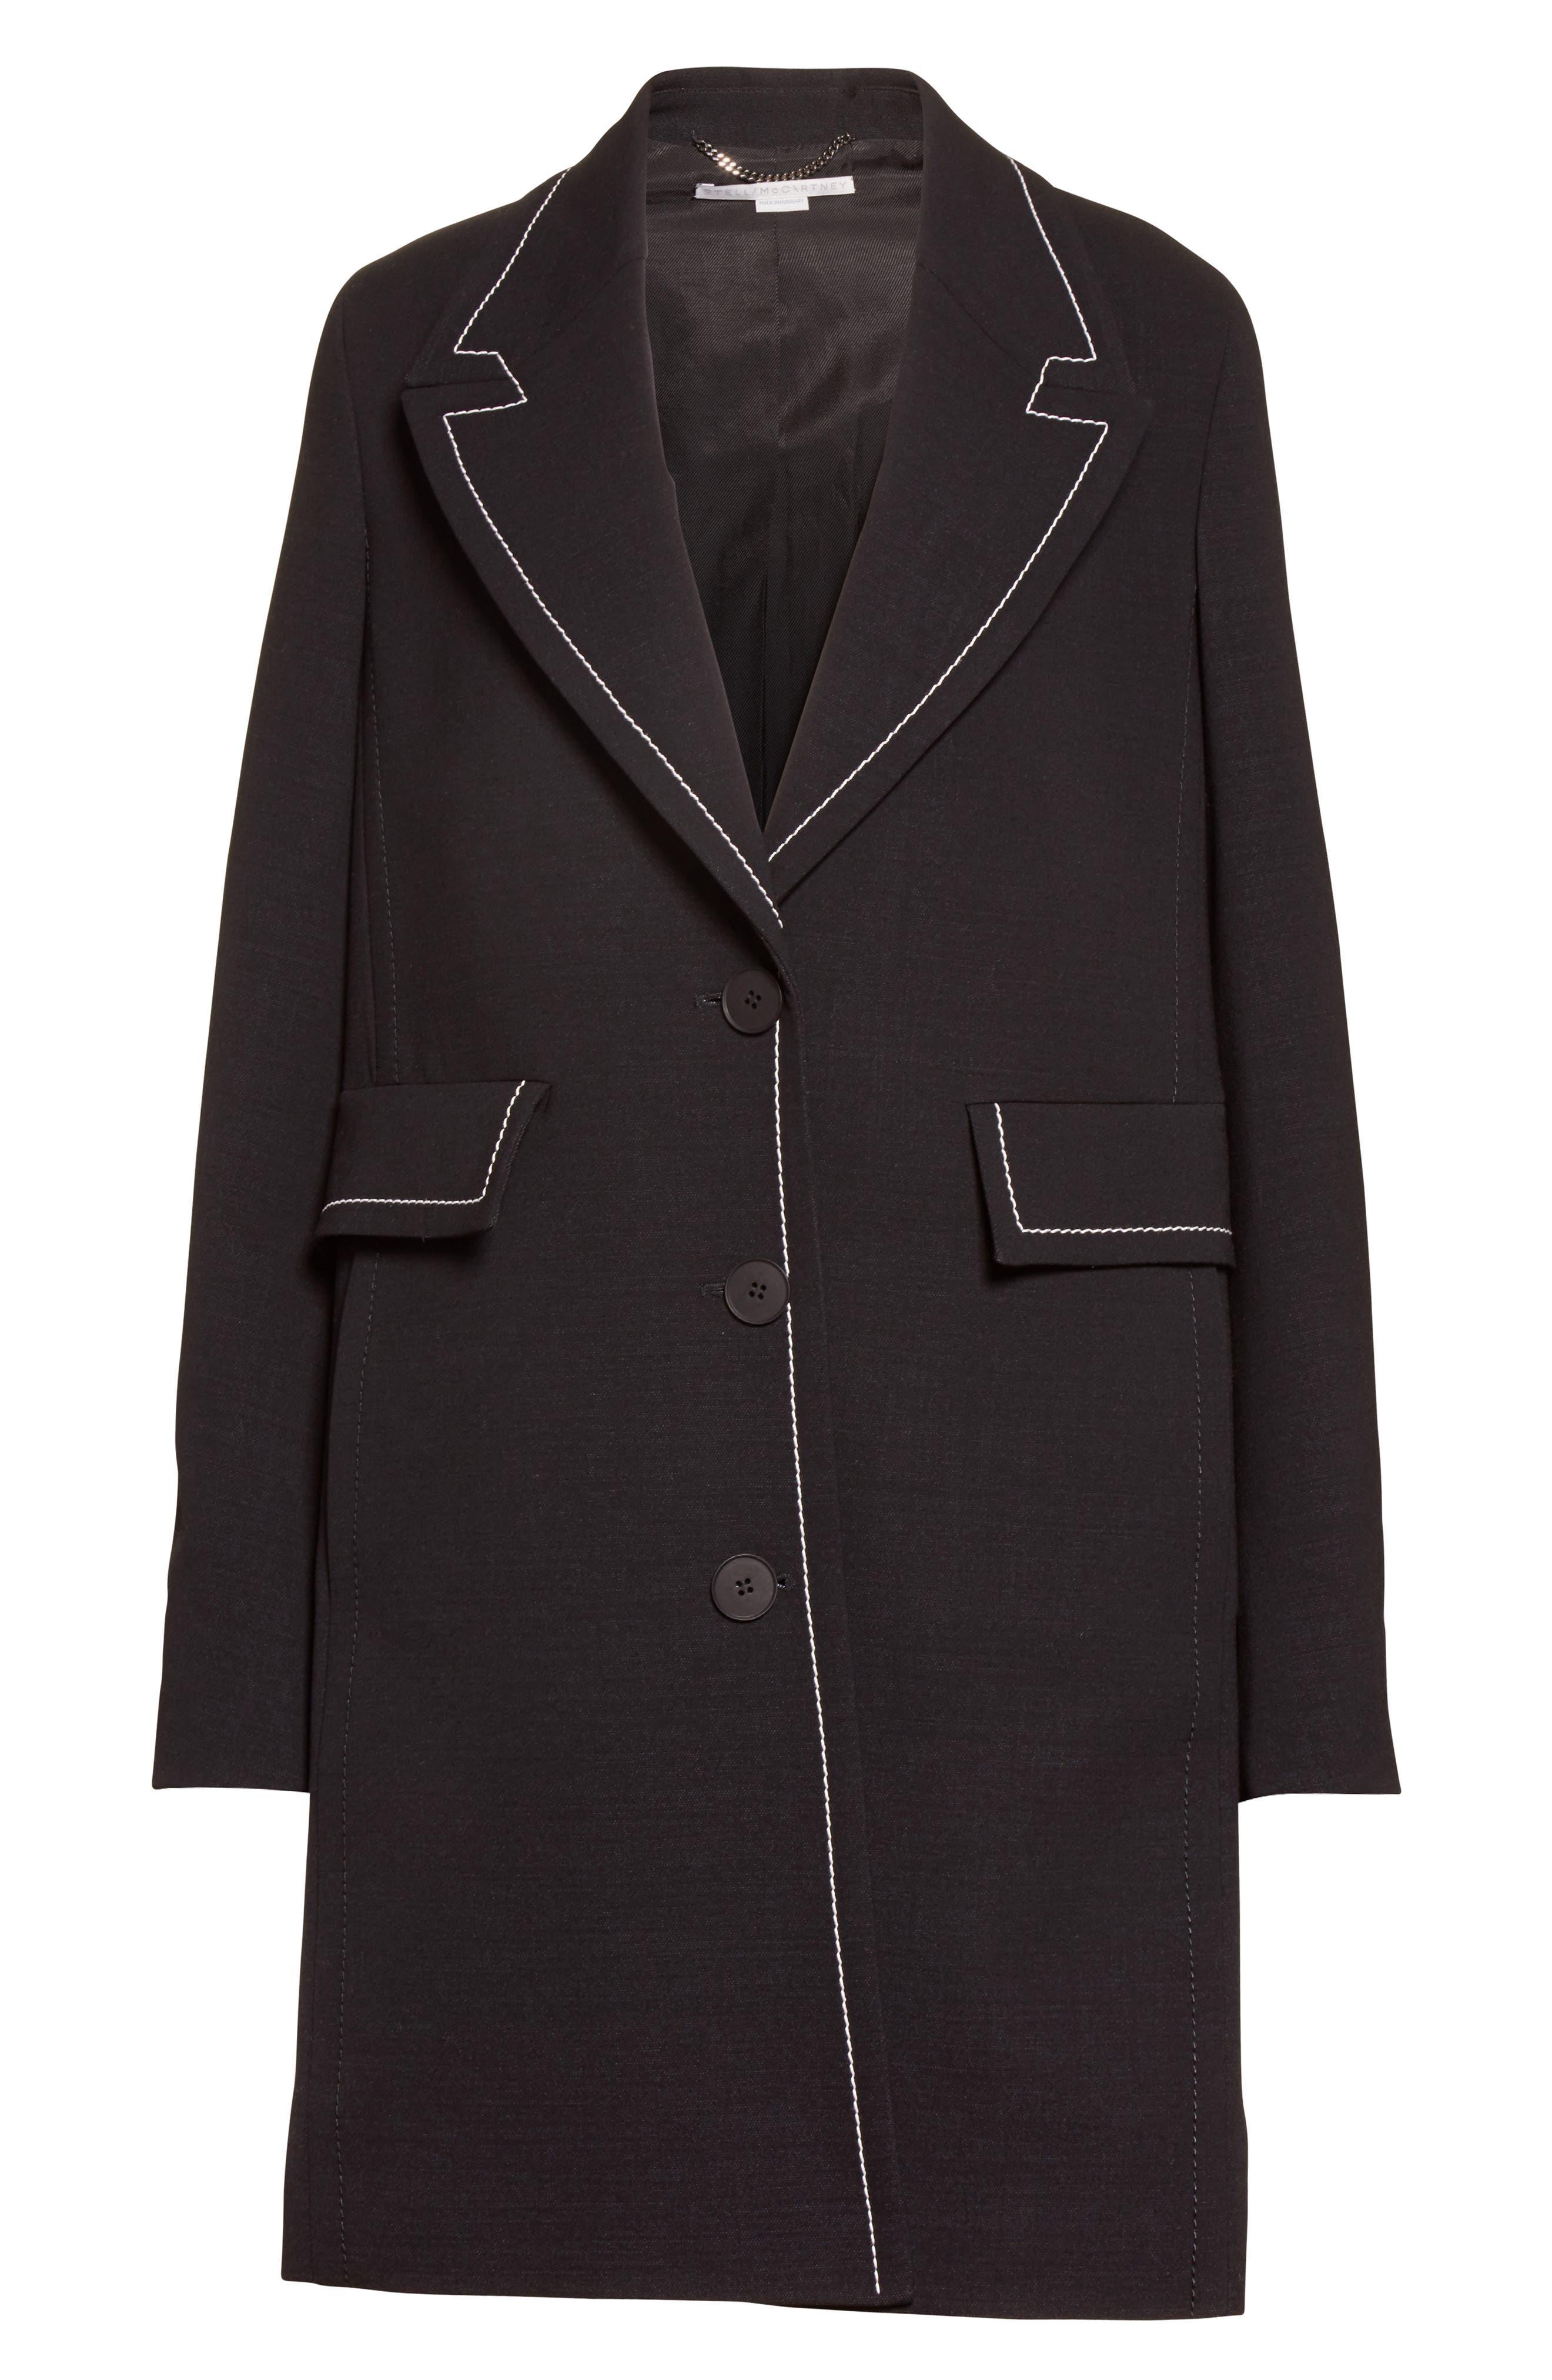 Marcelline Topstitch Double Face Wool Coat,                             Alternate thumbnail 4, color,                             Black/ Mistletoe